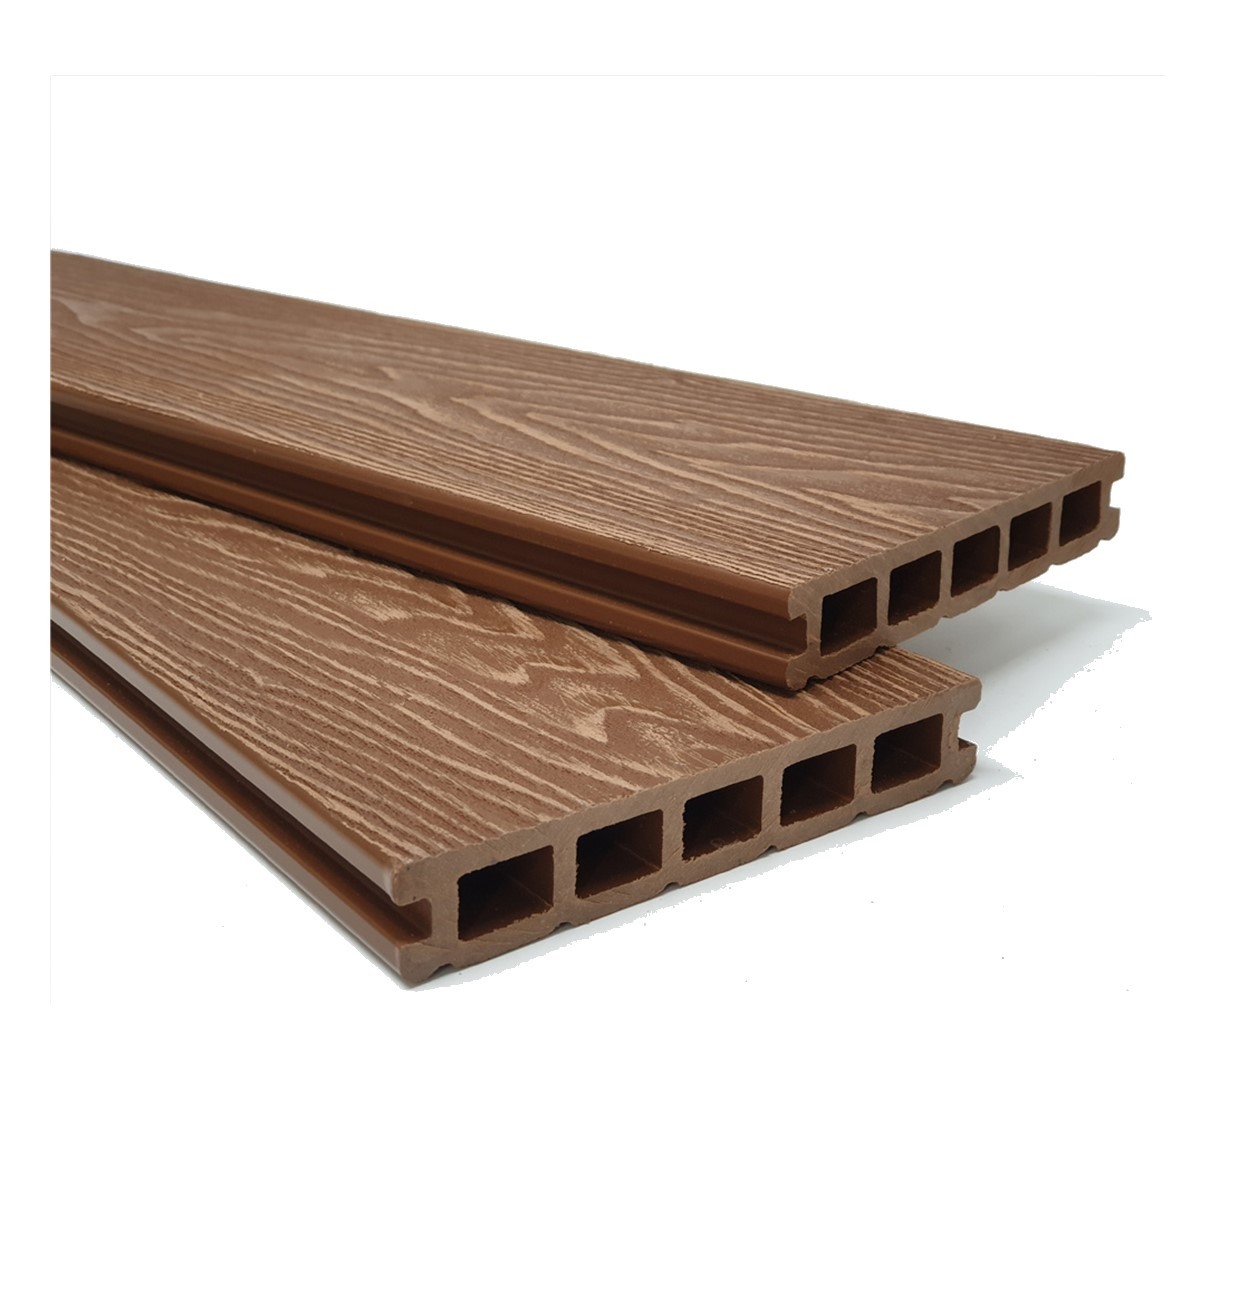 Teak Brown Wood Grain Composite Decking Kit 3.6m Boards (Reversible)